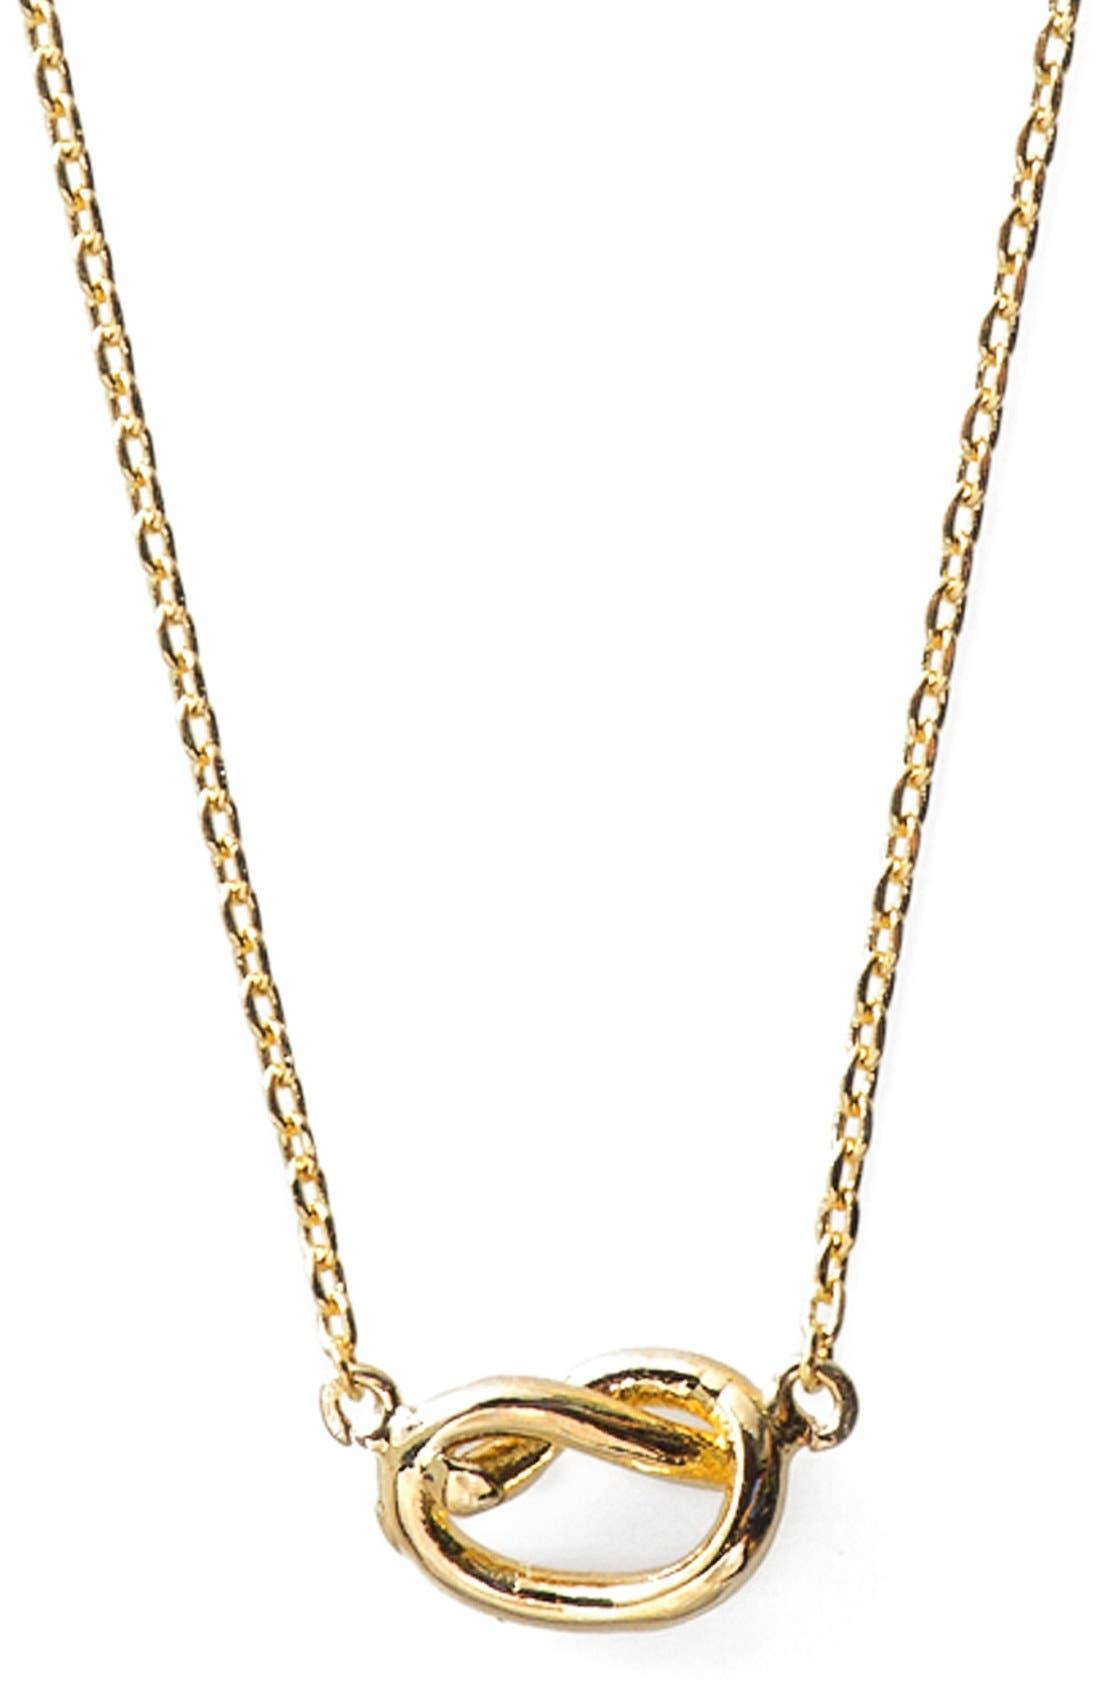 Alternate Image 1 Selected - Wanderlust + Co. Infinity Pendant Necklace